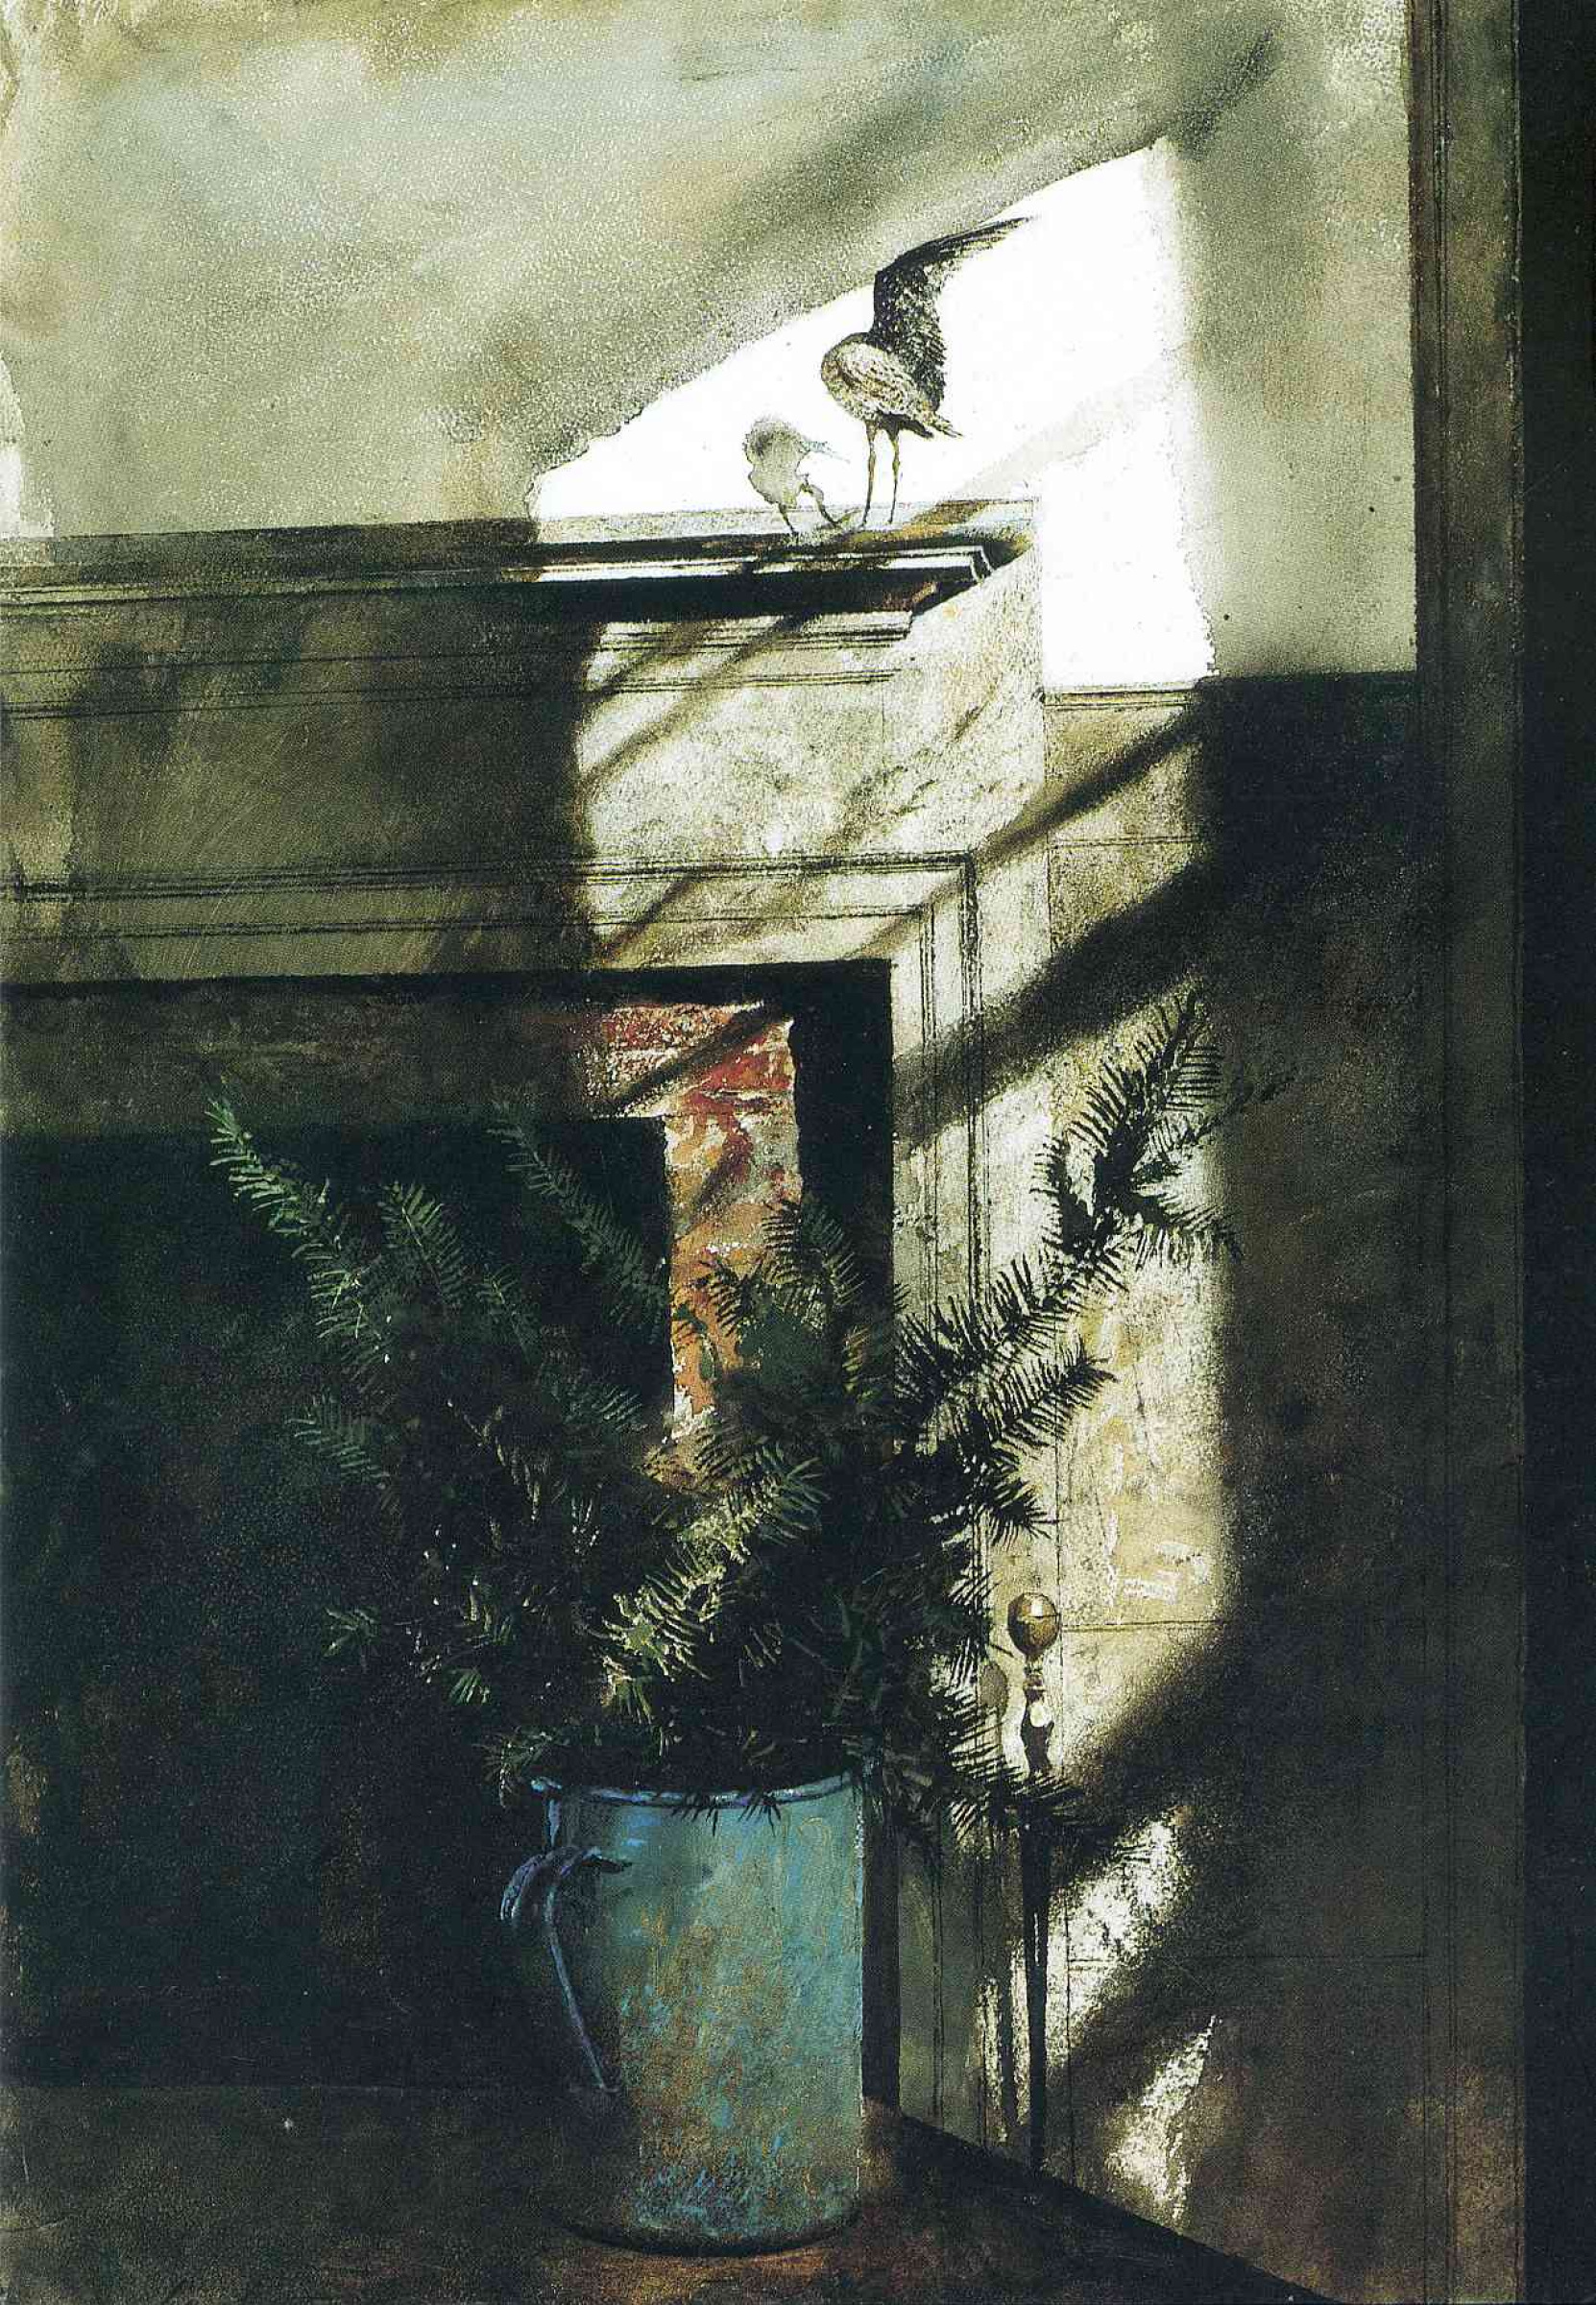 Эндрю Уайет. Птица в доме, 1984